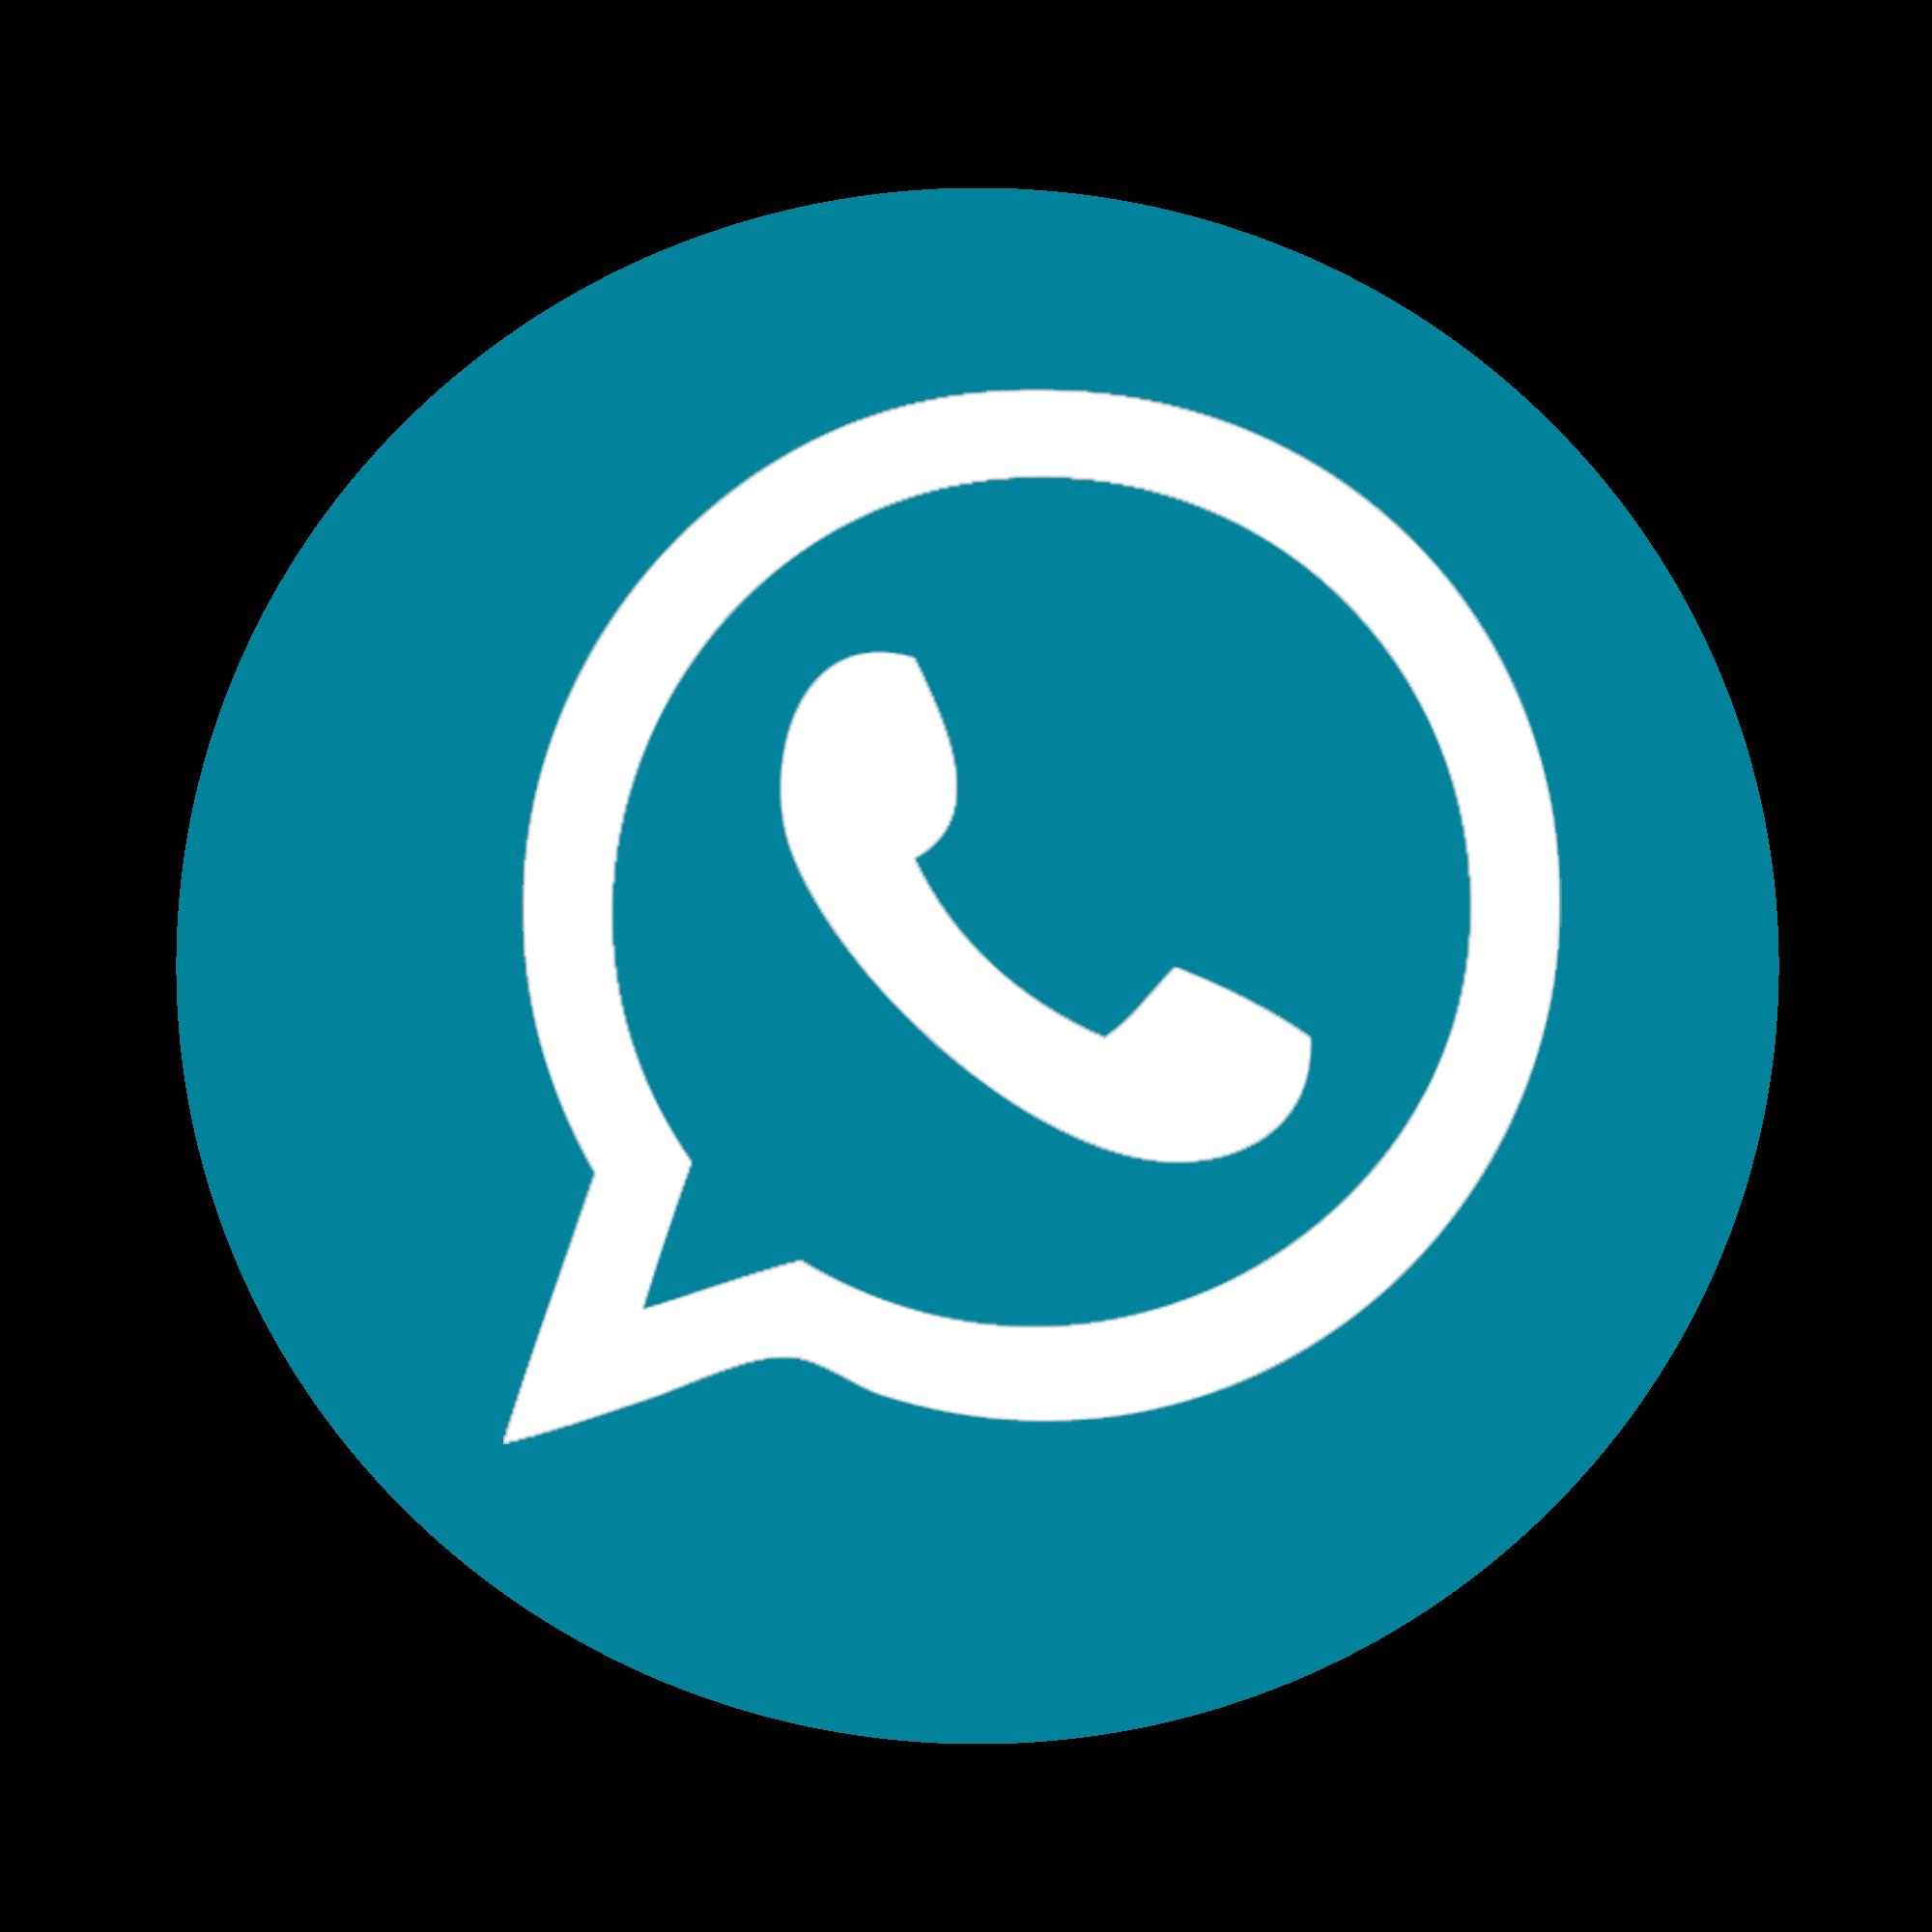 WhatsApp iPhone Whatsapp icon transparent png